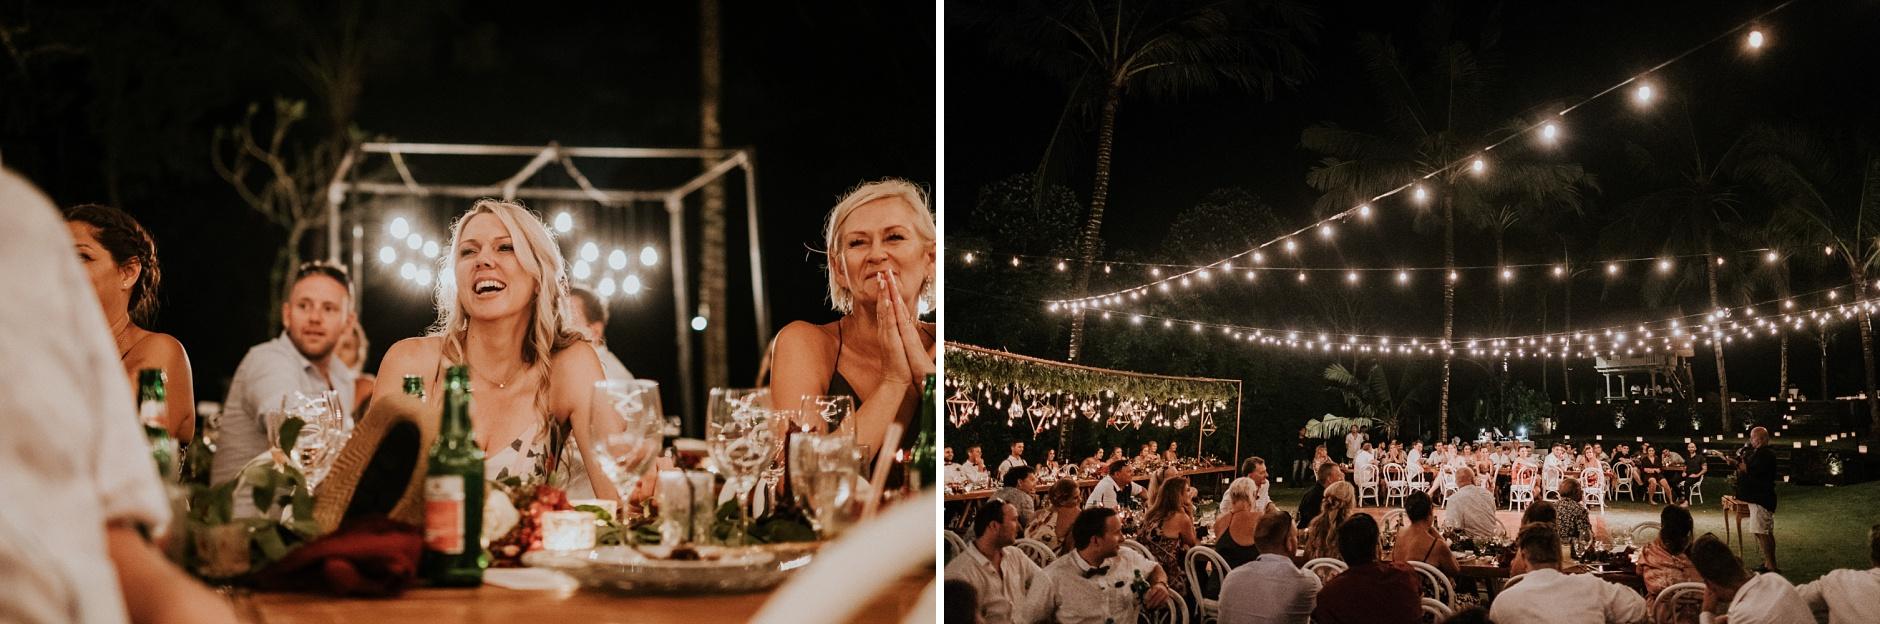 breanna&dan0655a_Bali-Wedding-Photographer.jpg